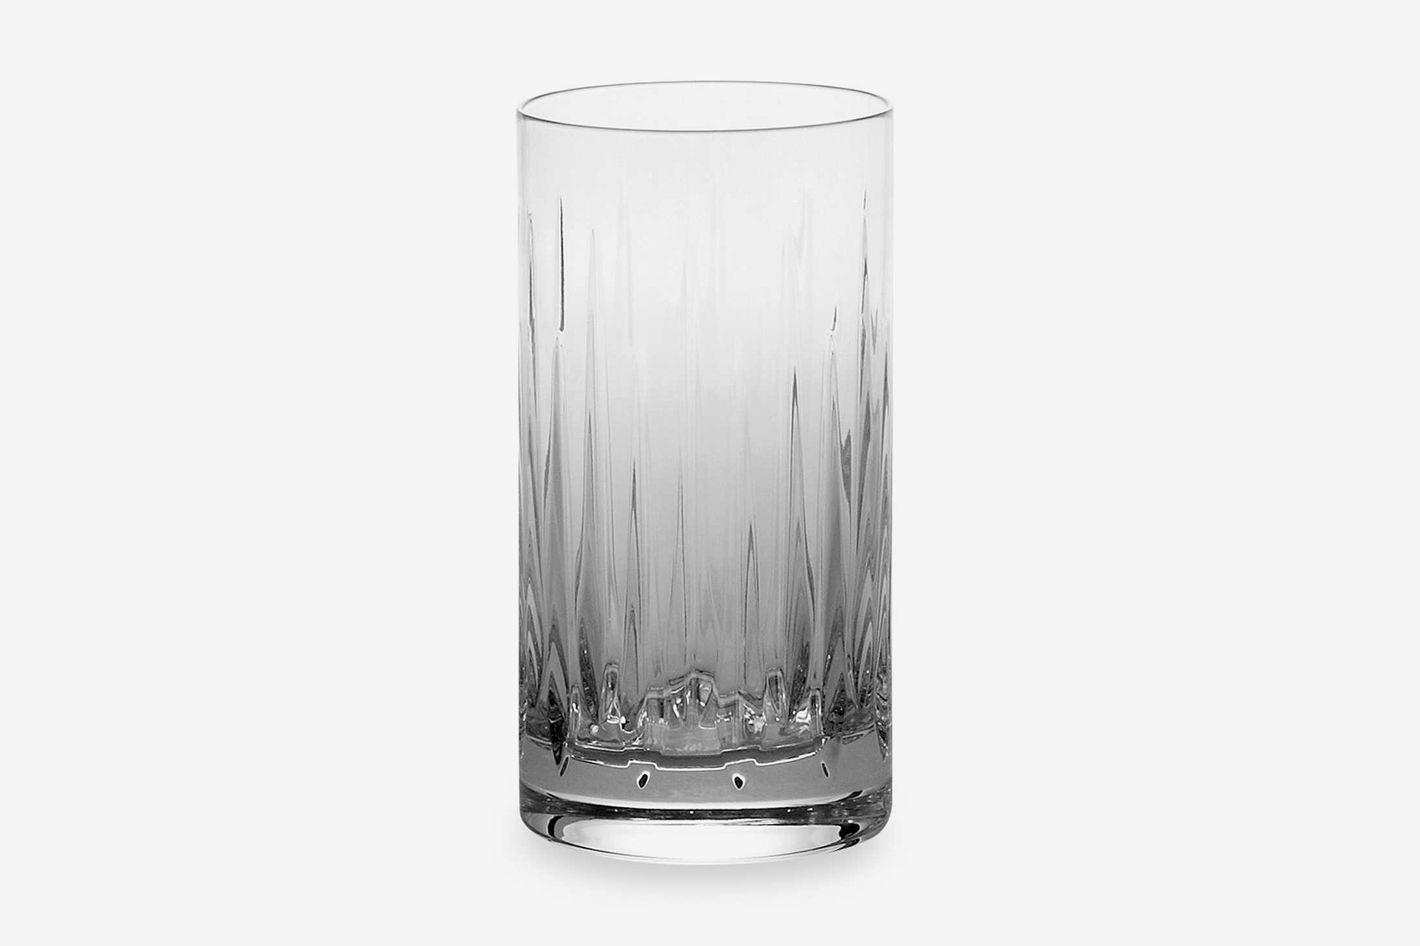 Reed & Barton Soho Highball Glasses (Set of 4)